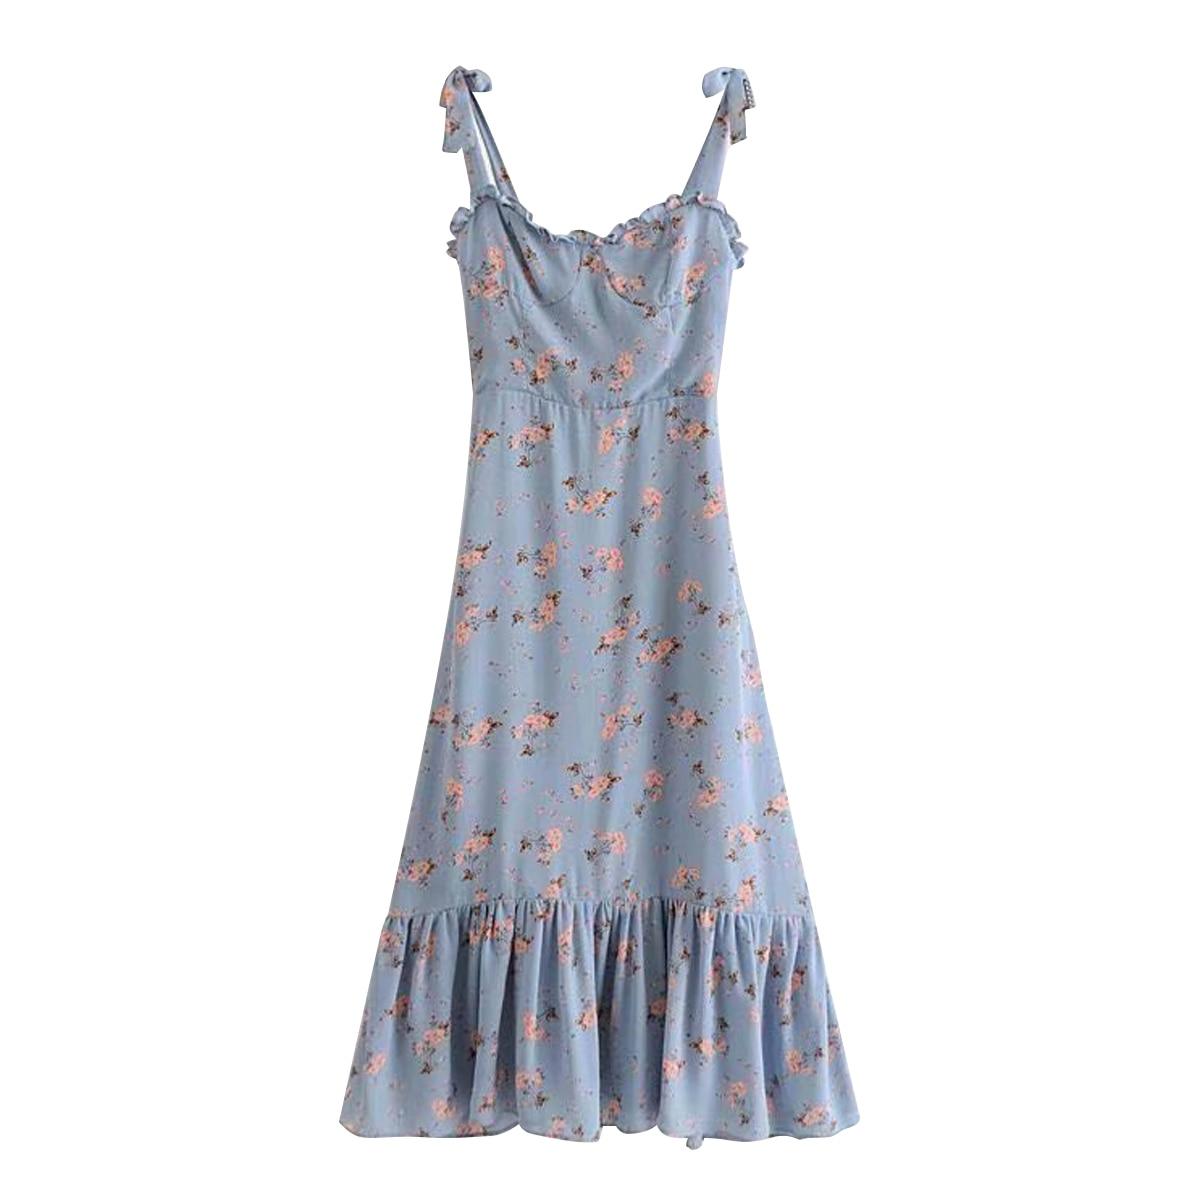 d2d782988e897 Nikita Blue Chic Midi Dress Women Summer Sleeveless Strapless Ruffles Sexy  Dresses 2019 Vintage Elegant Floral Printed Dress - lztees